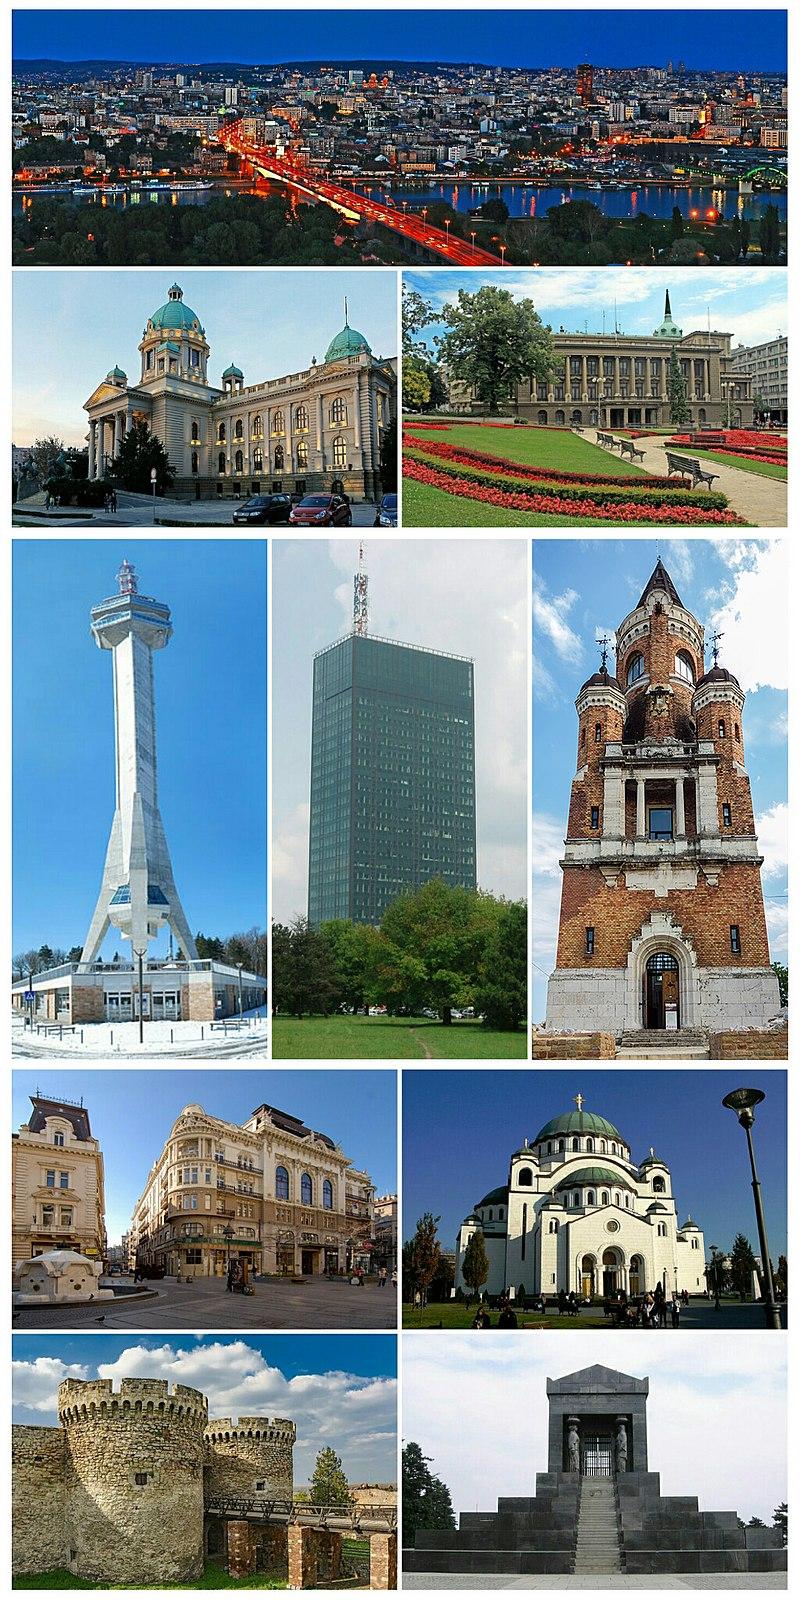 Beograd collage.jpg